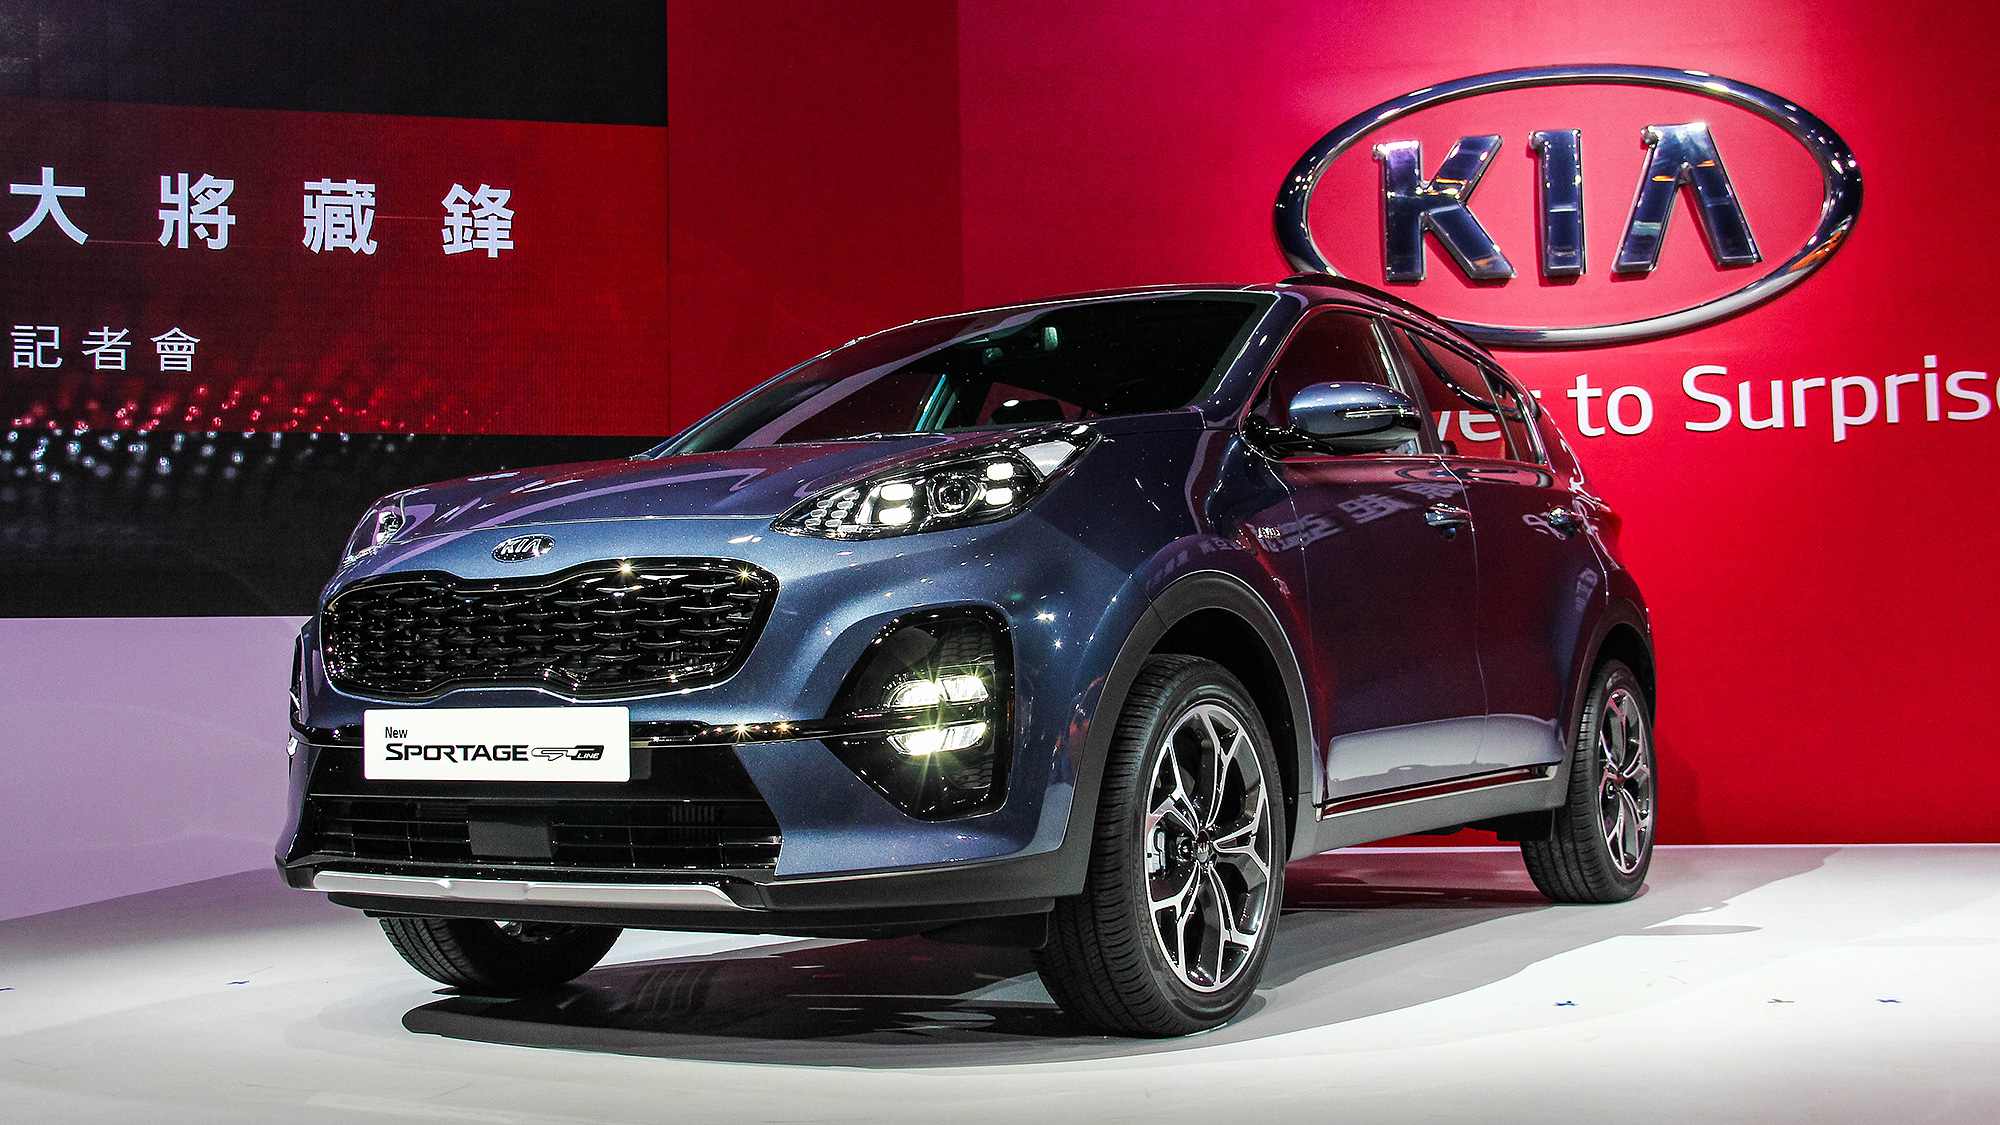 Kia Sportage 小改款全車系標配全速域 SCC ,三車型 113.9 萬元起上市